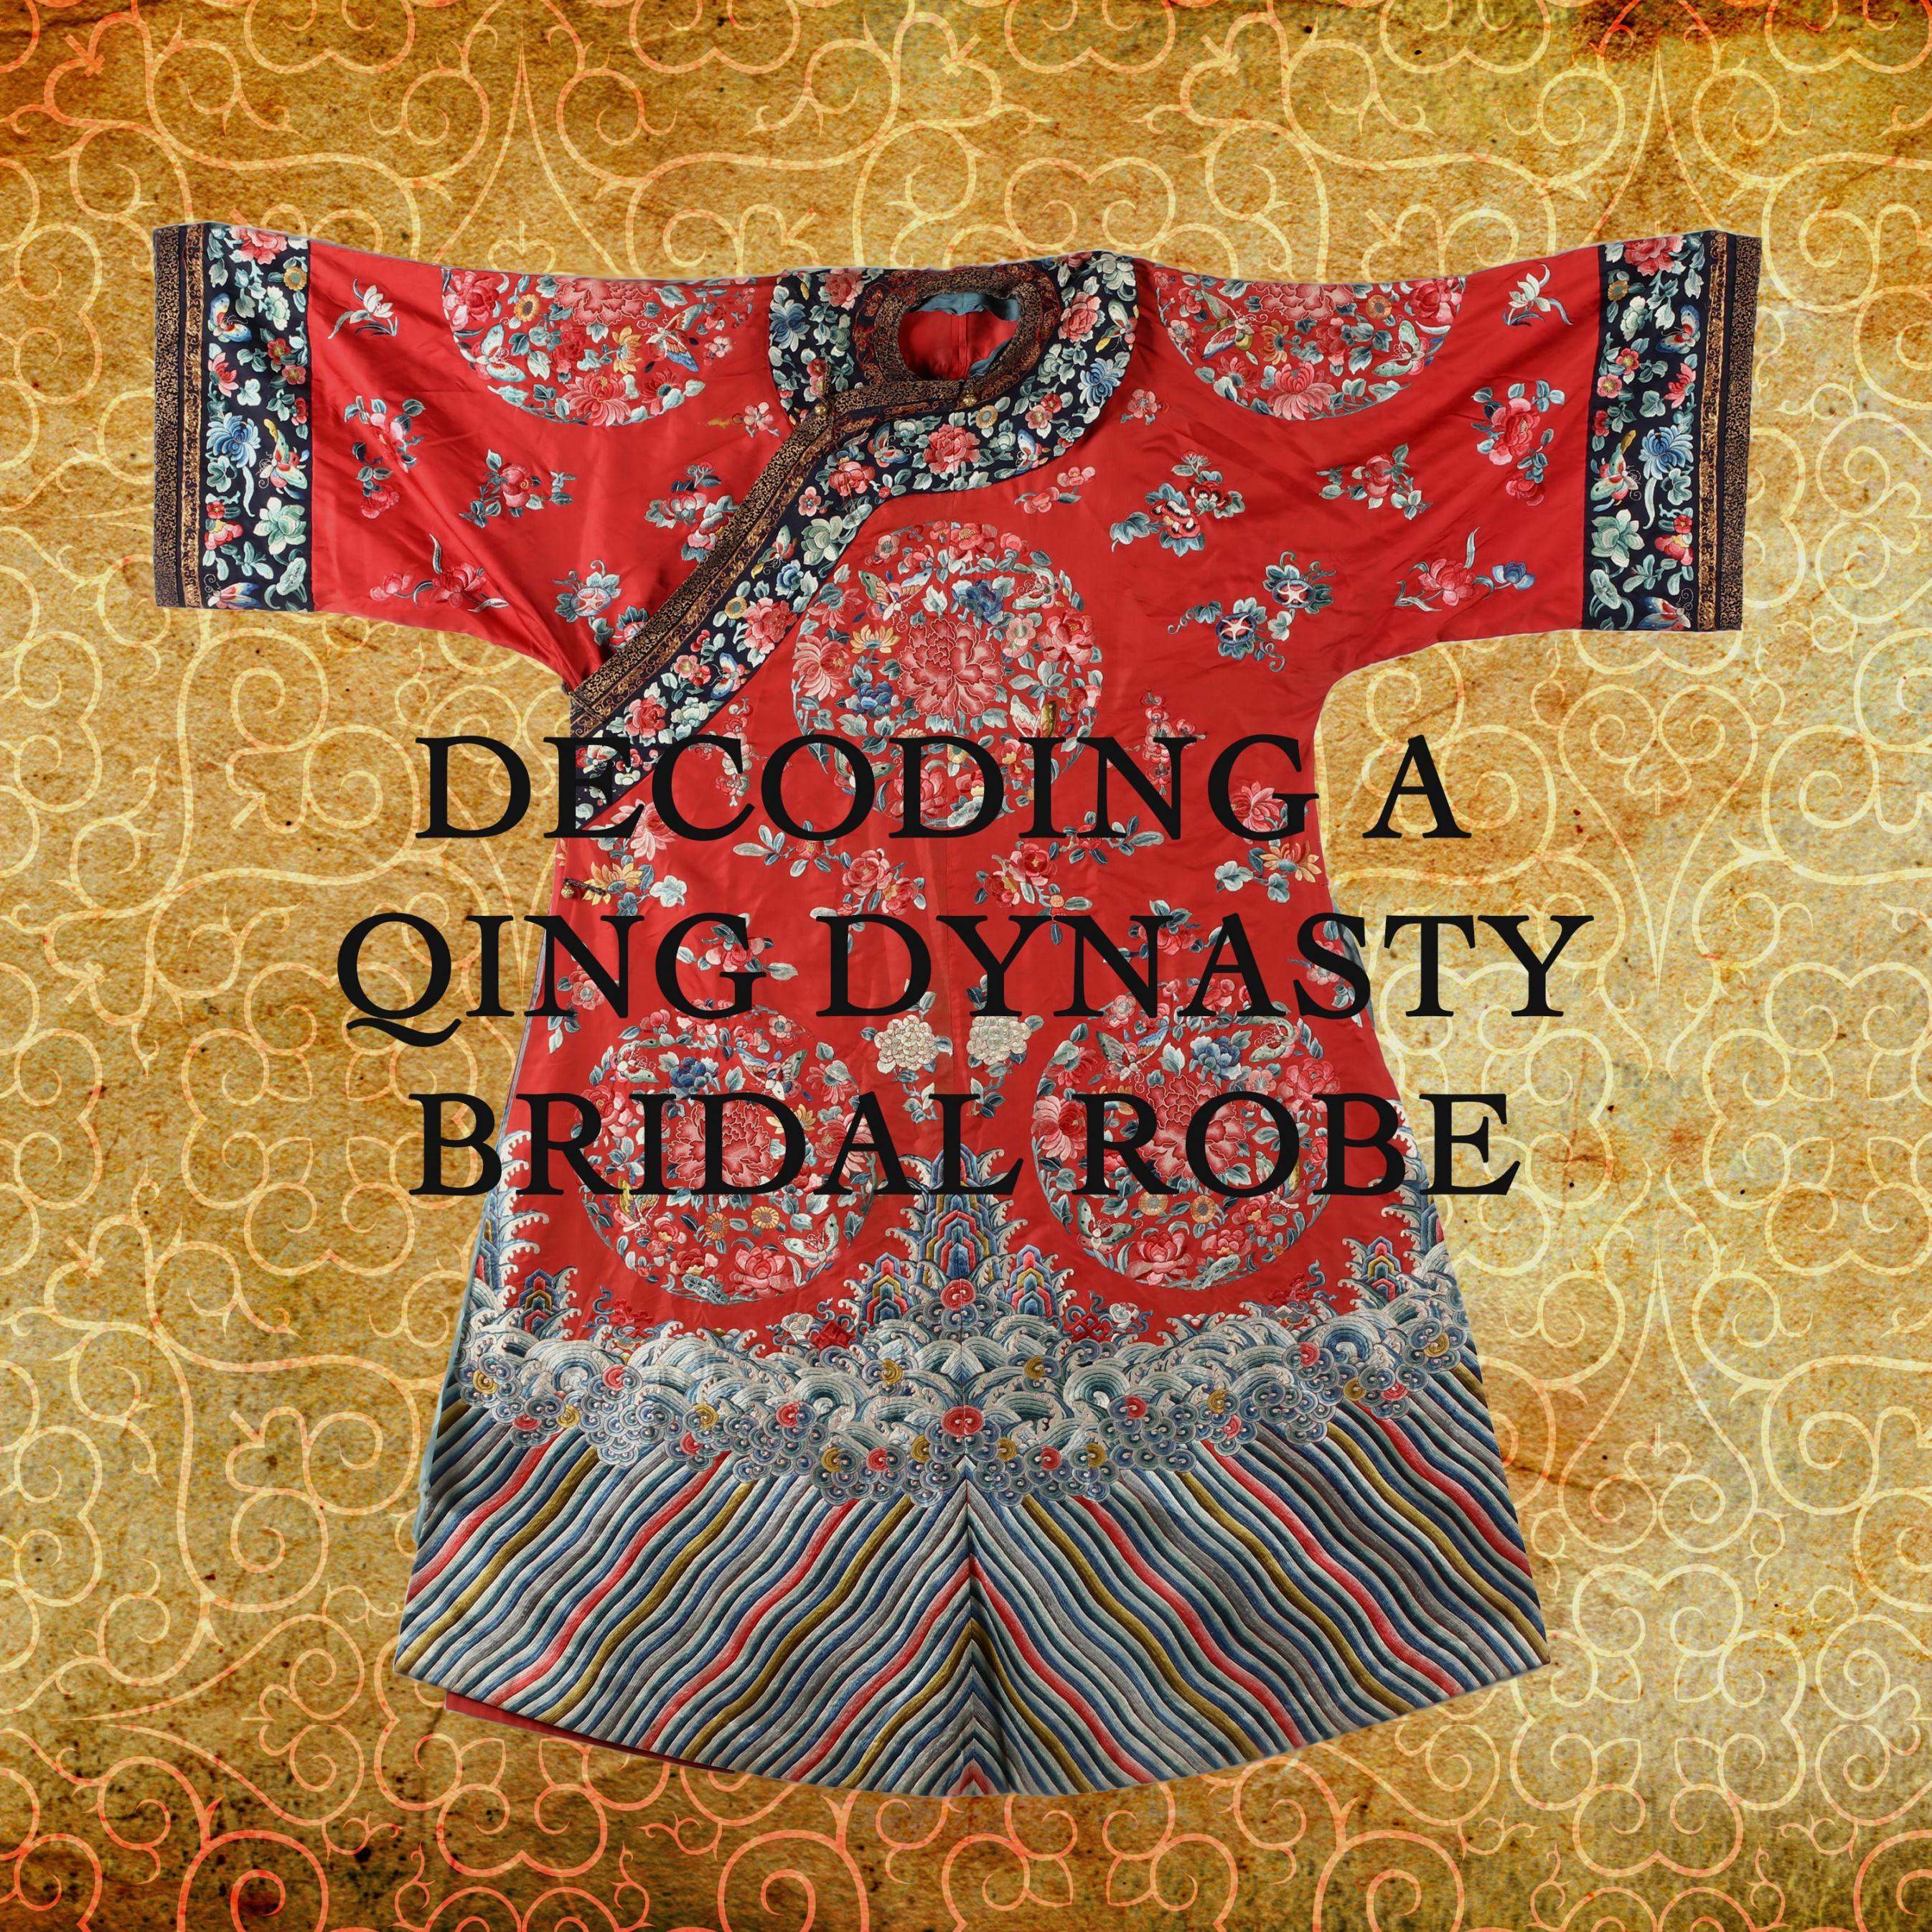 Decoding A Chinese Bridal Robe